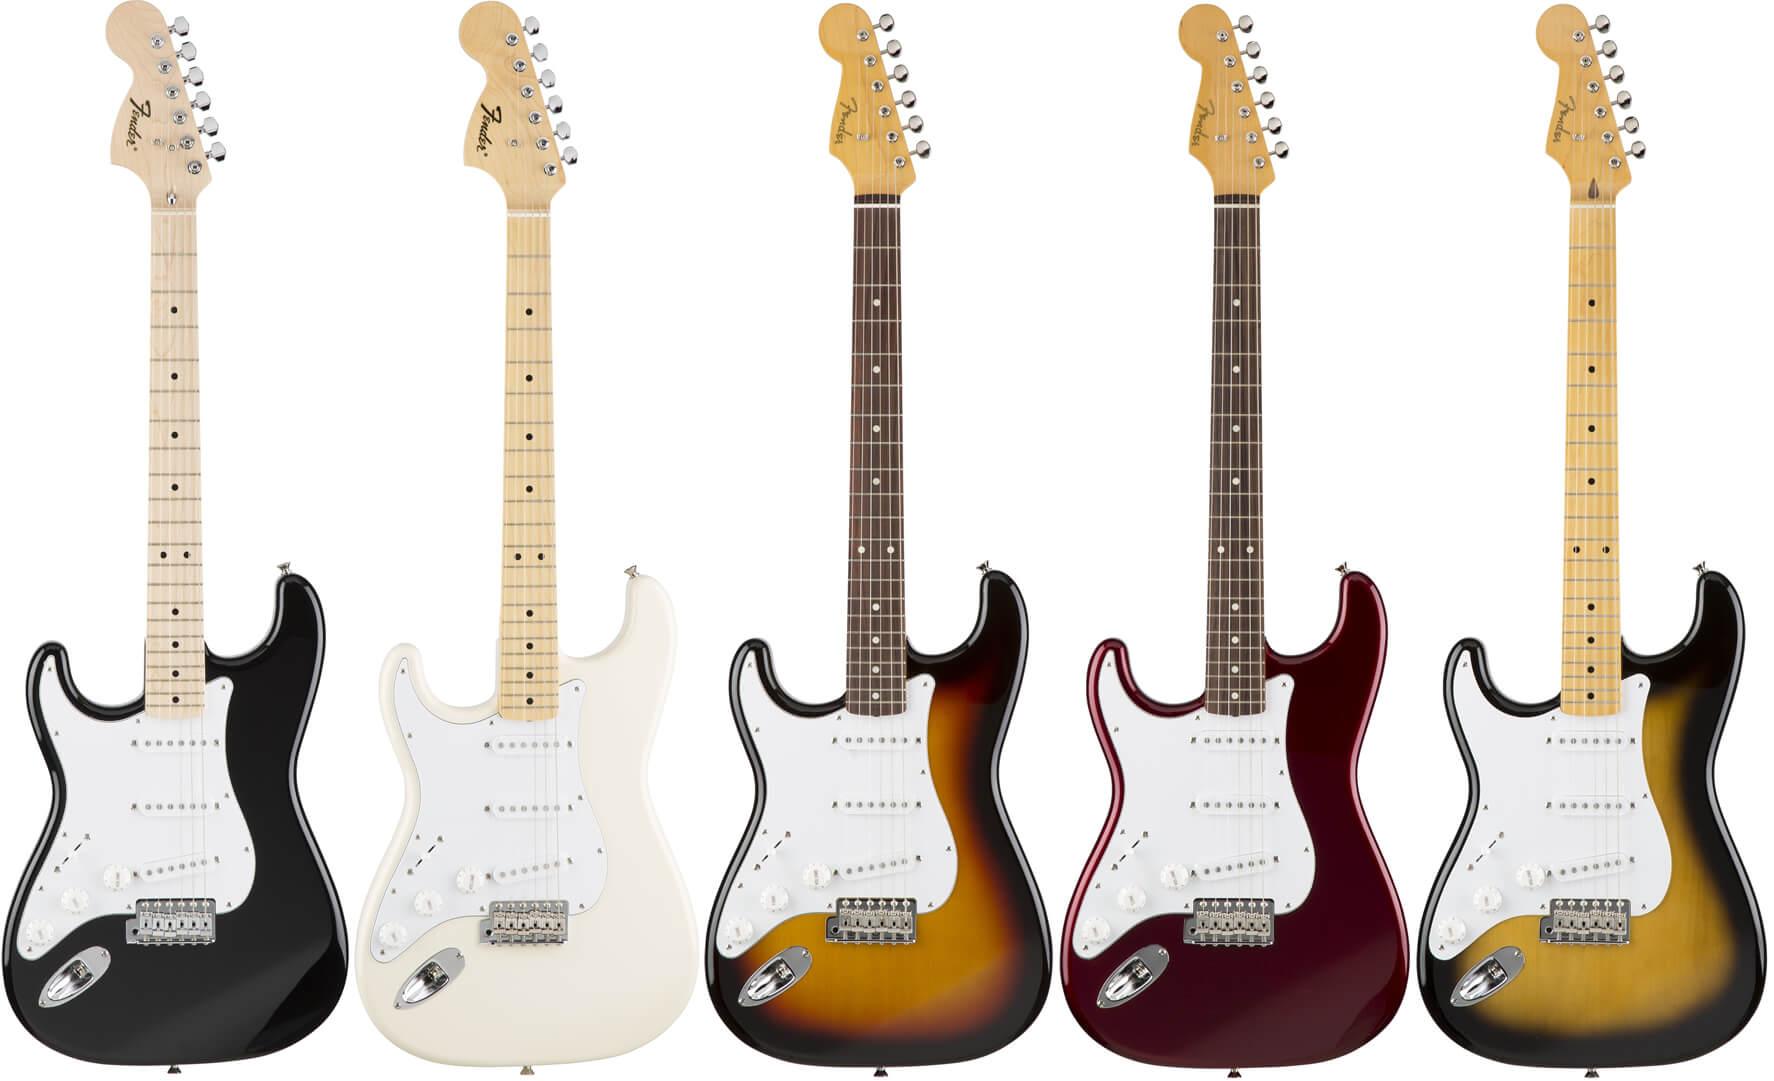 Fender Classic Strat Lefty